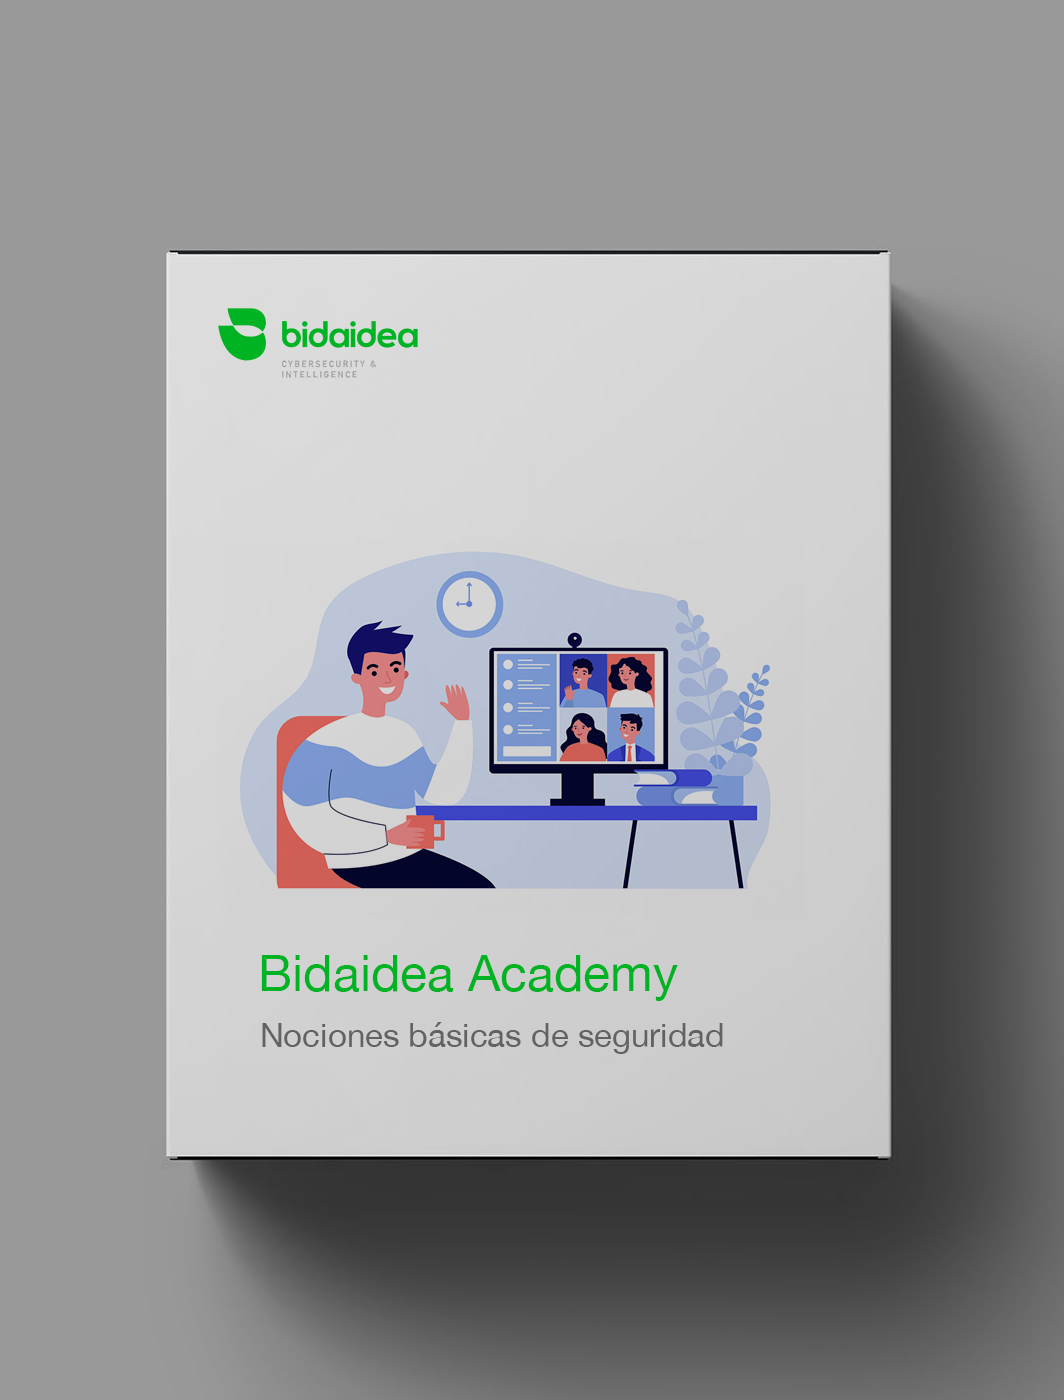 cyberpacks bidaidea academy 01 - Empresa de Ciberseguridad